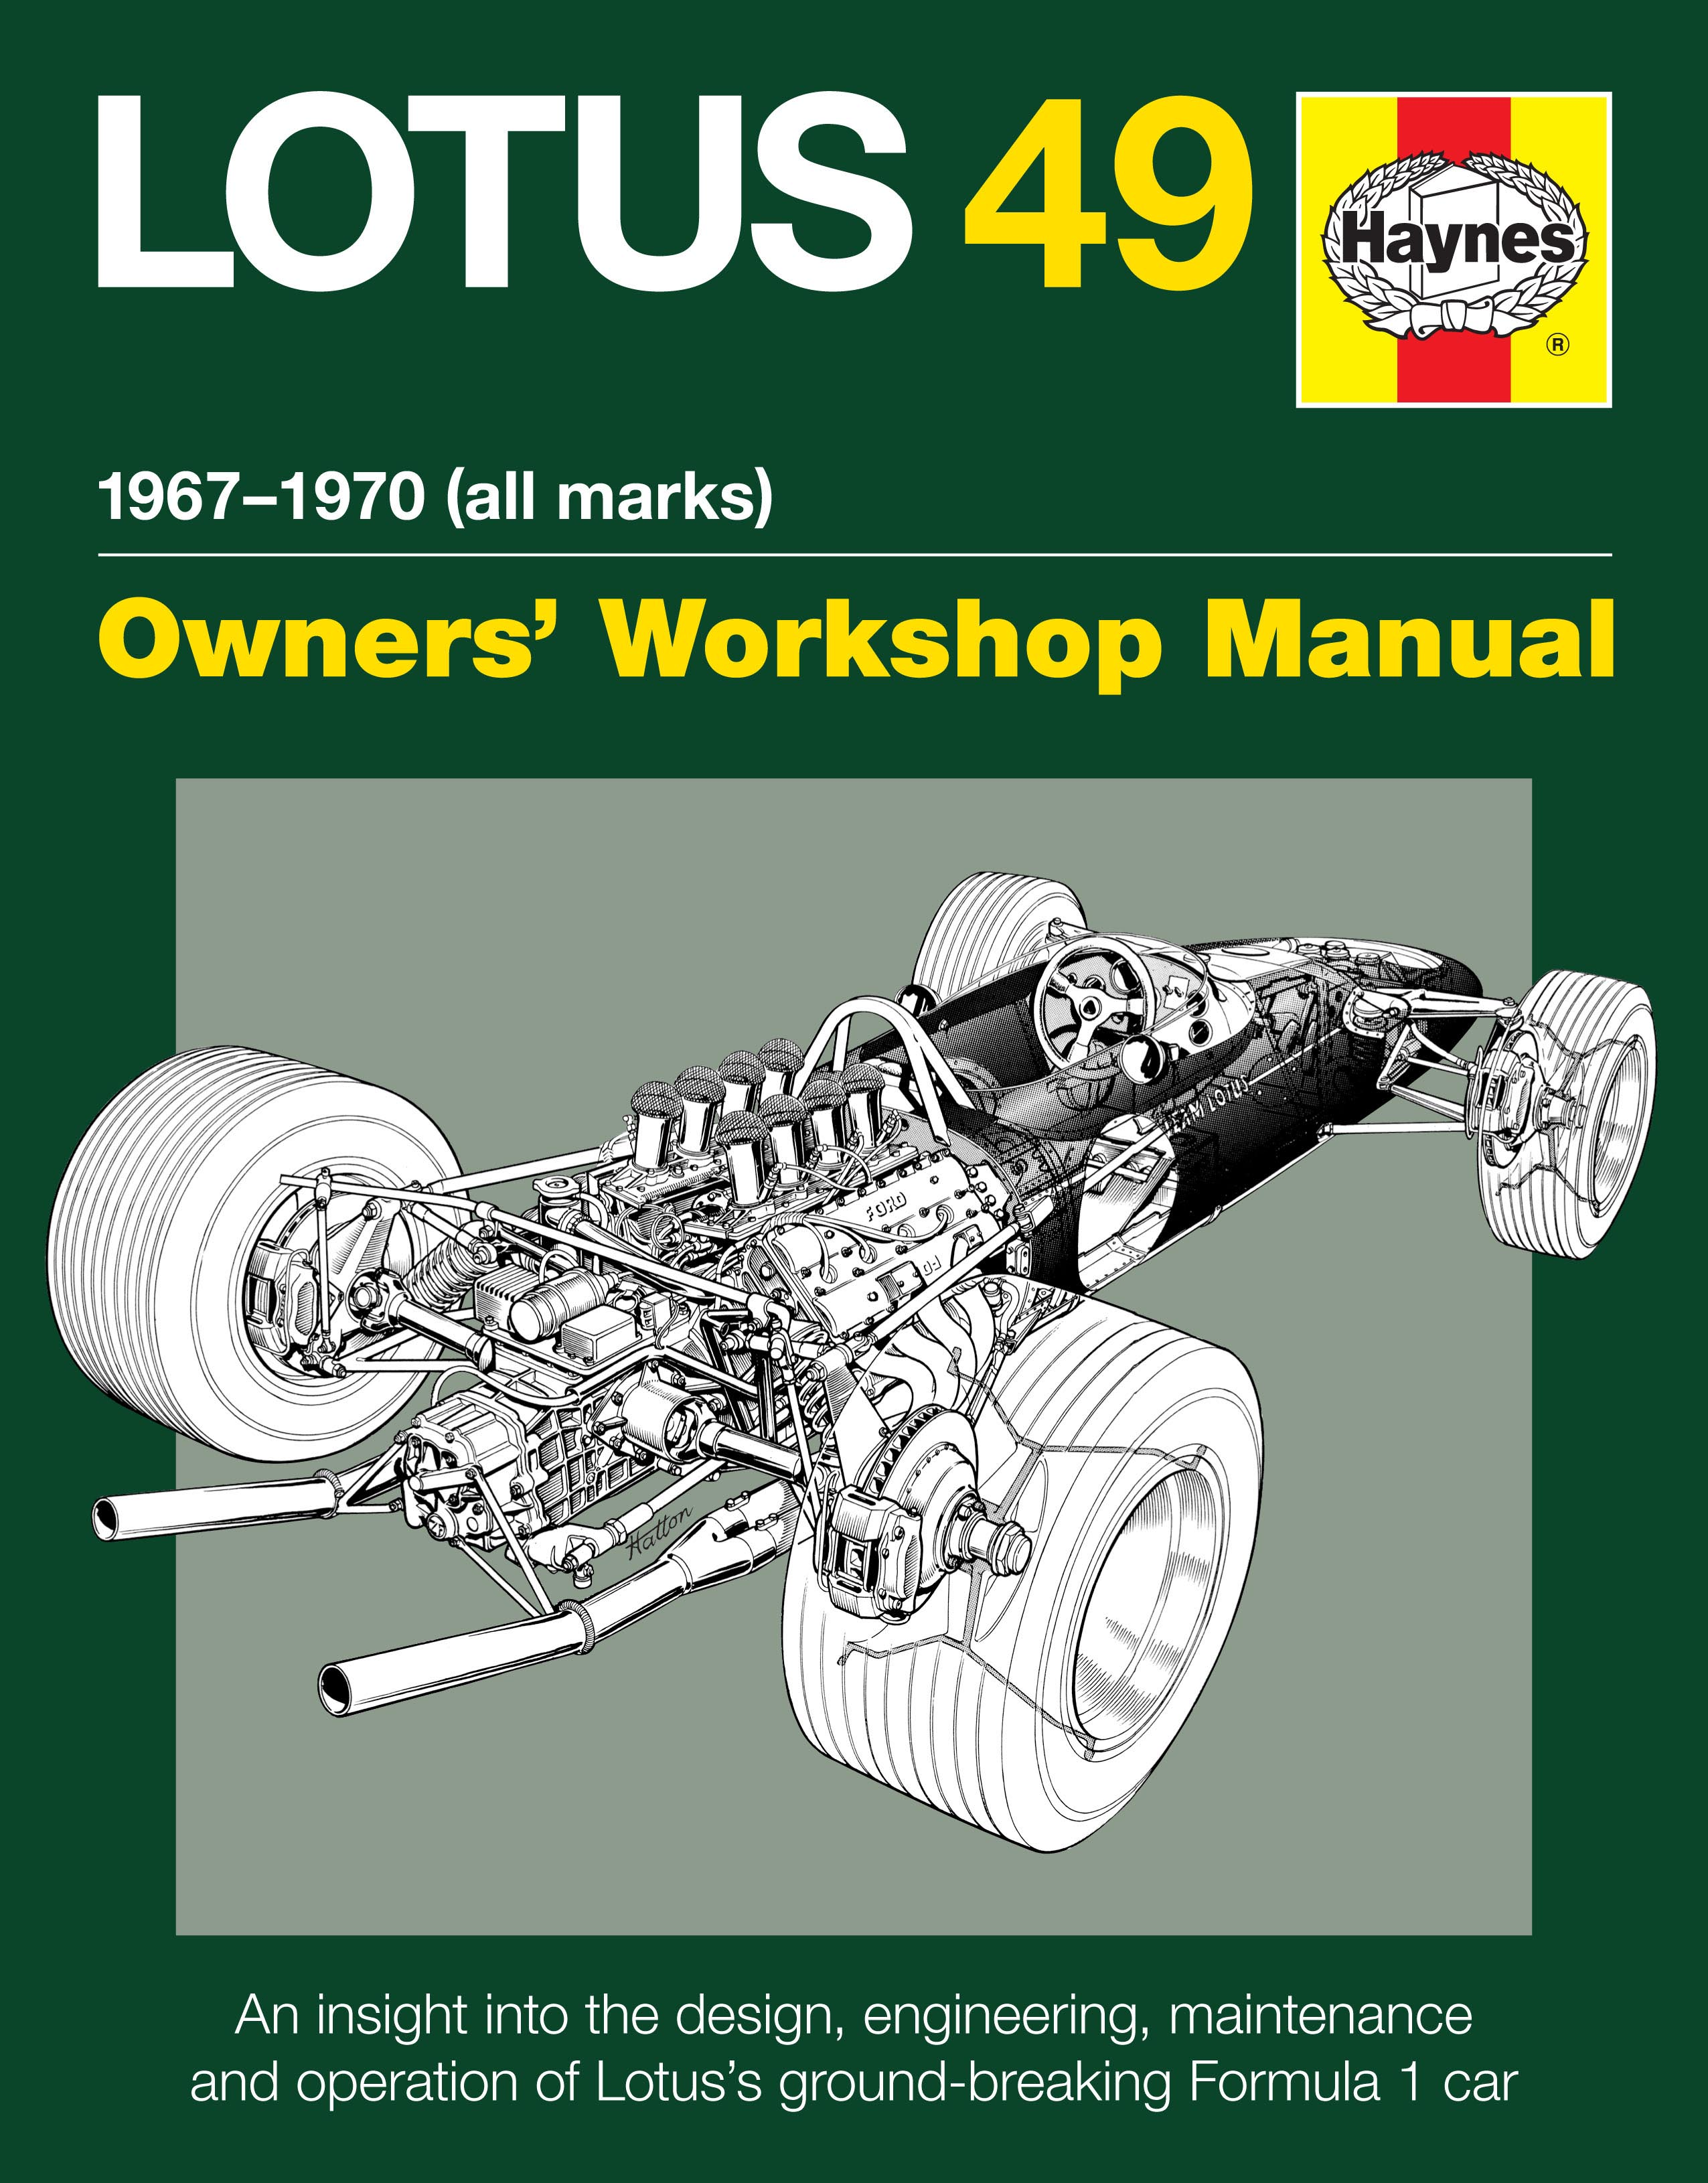 Lotus 49 Manual